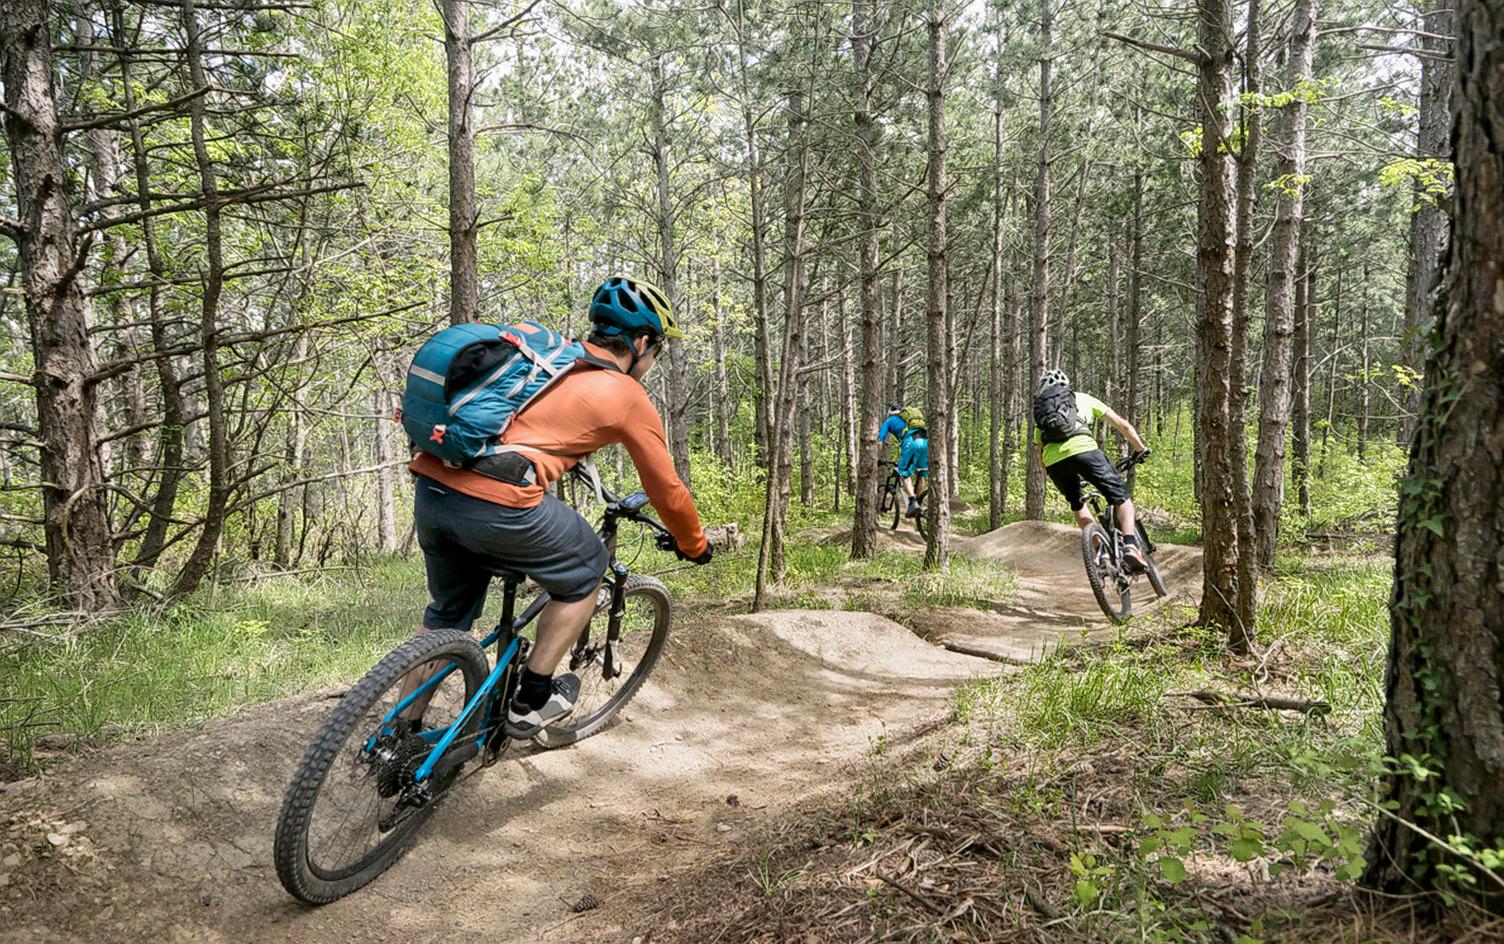 1512732763_essential-mountain-biking-tips-for-beginners.jpg